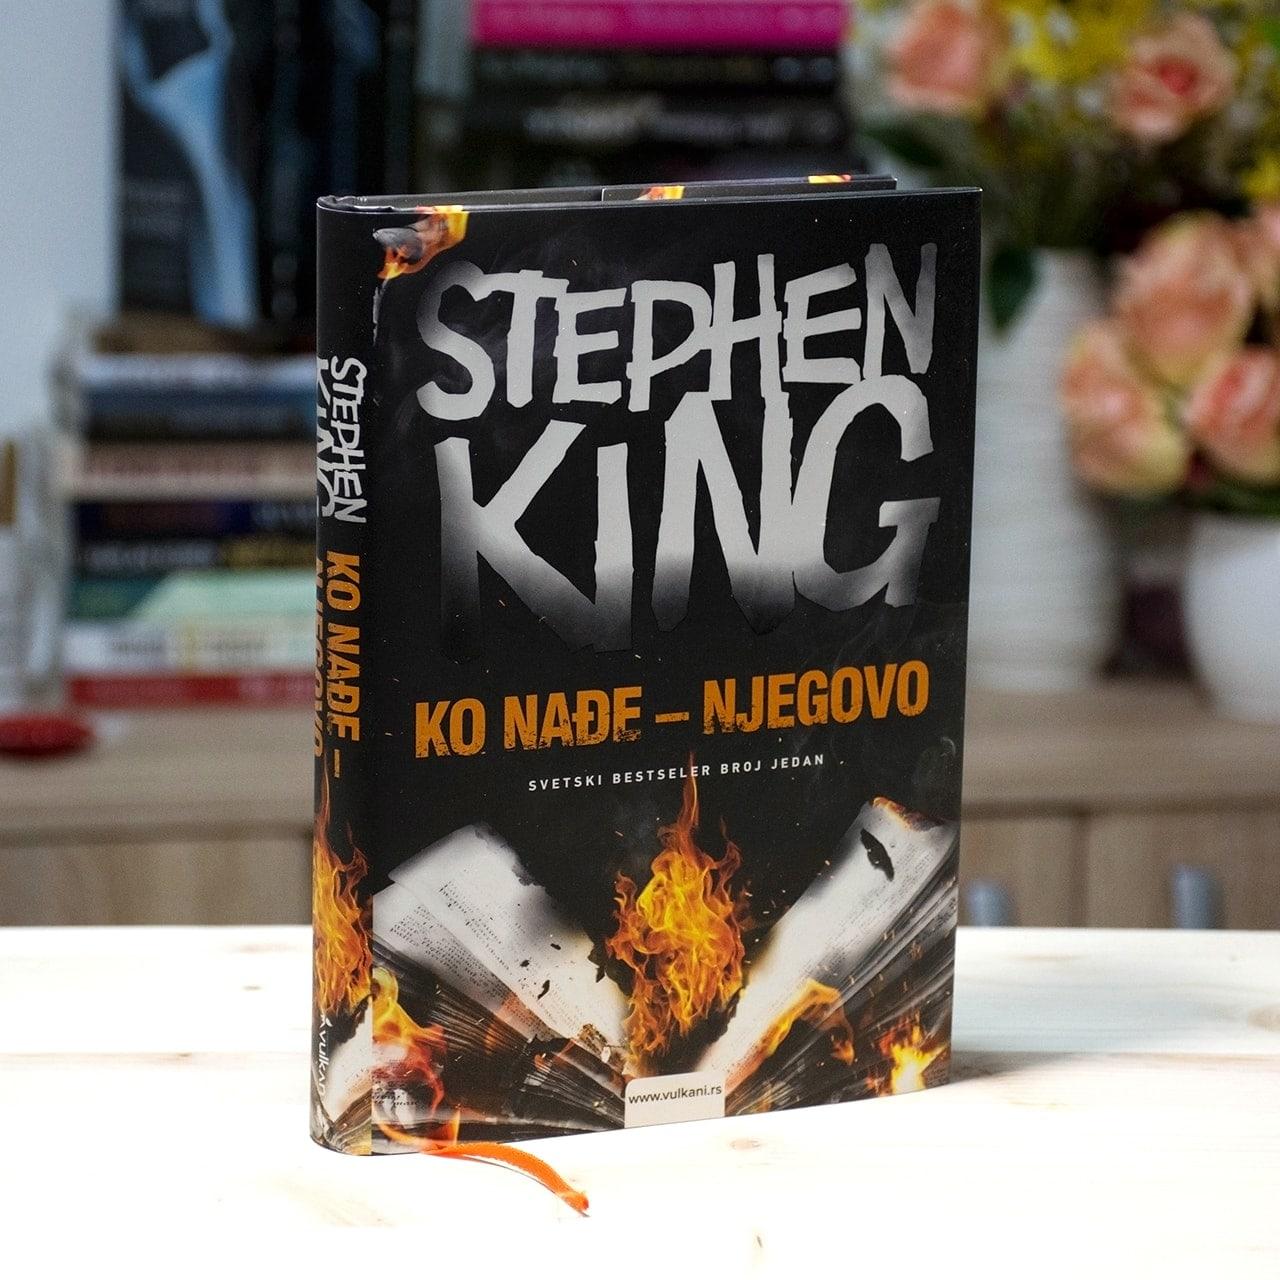 Ko nađe-njegovo - Stiven King